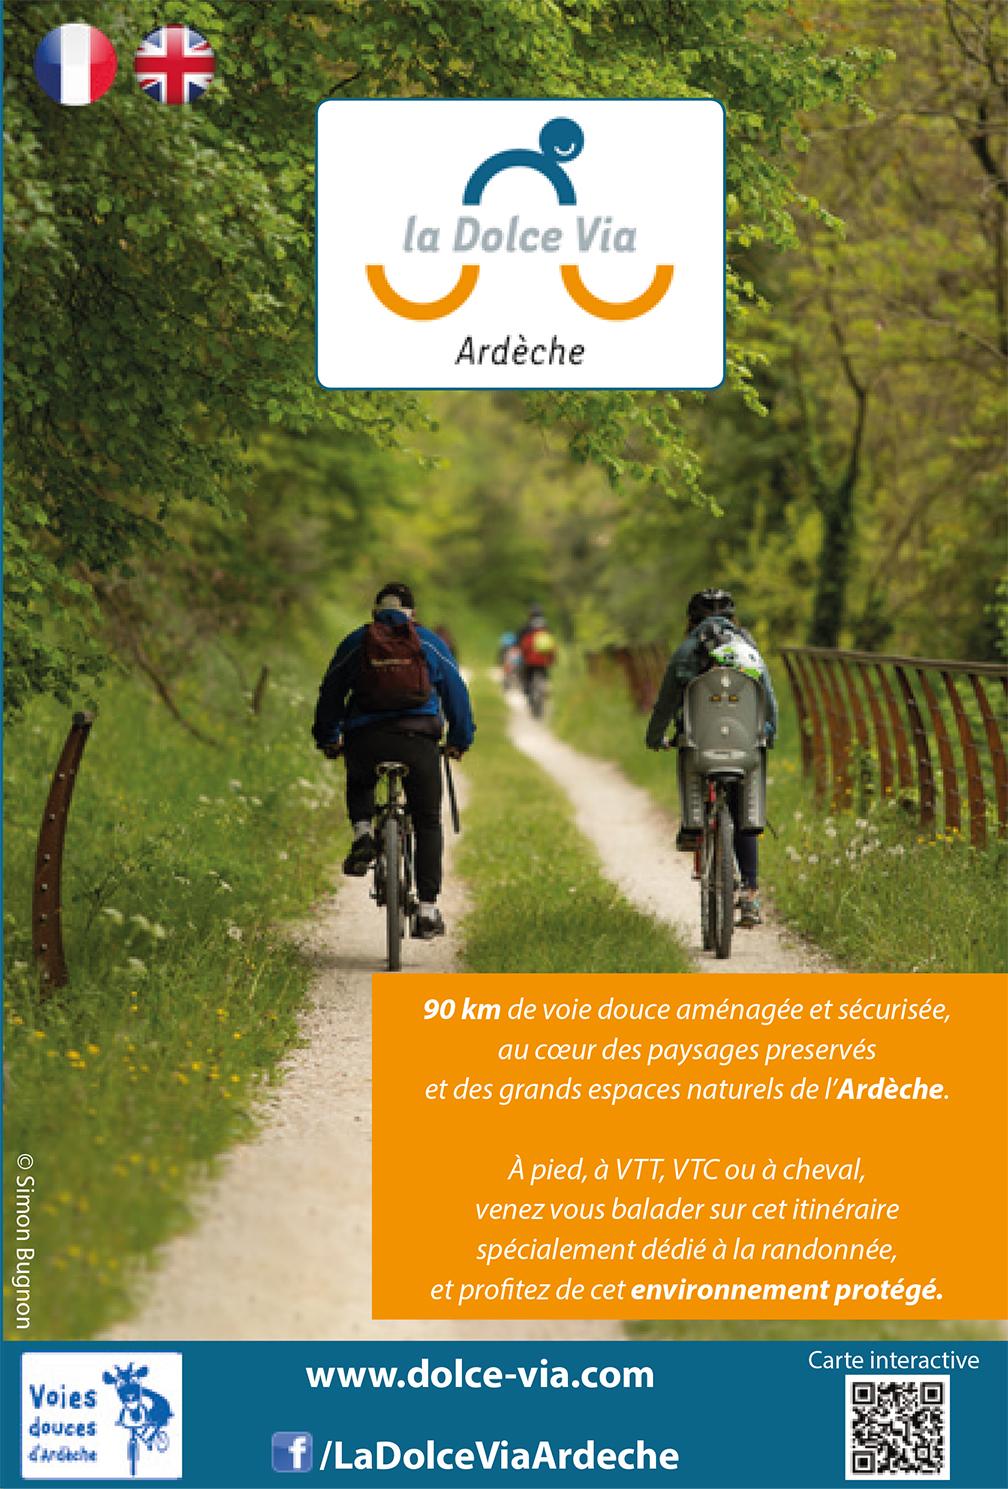 Dolce via cycle path brochure